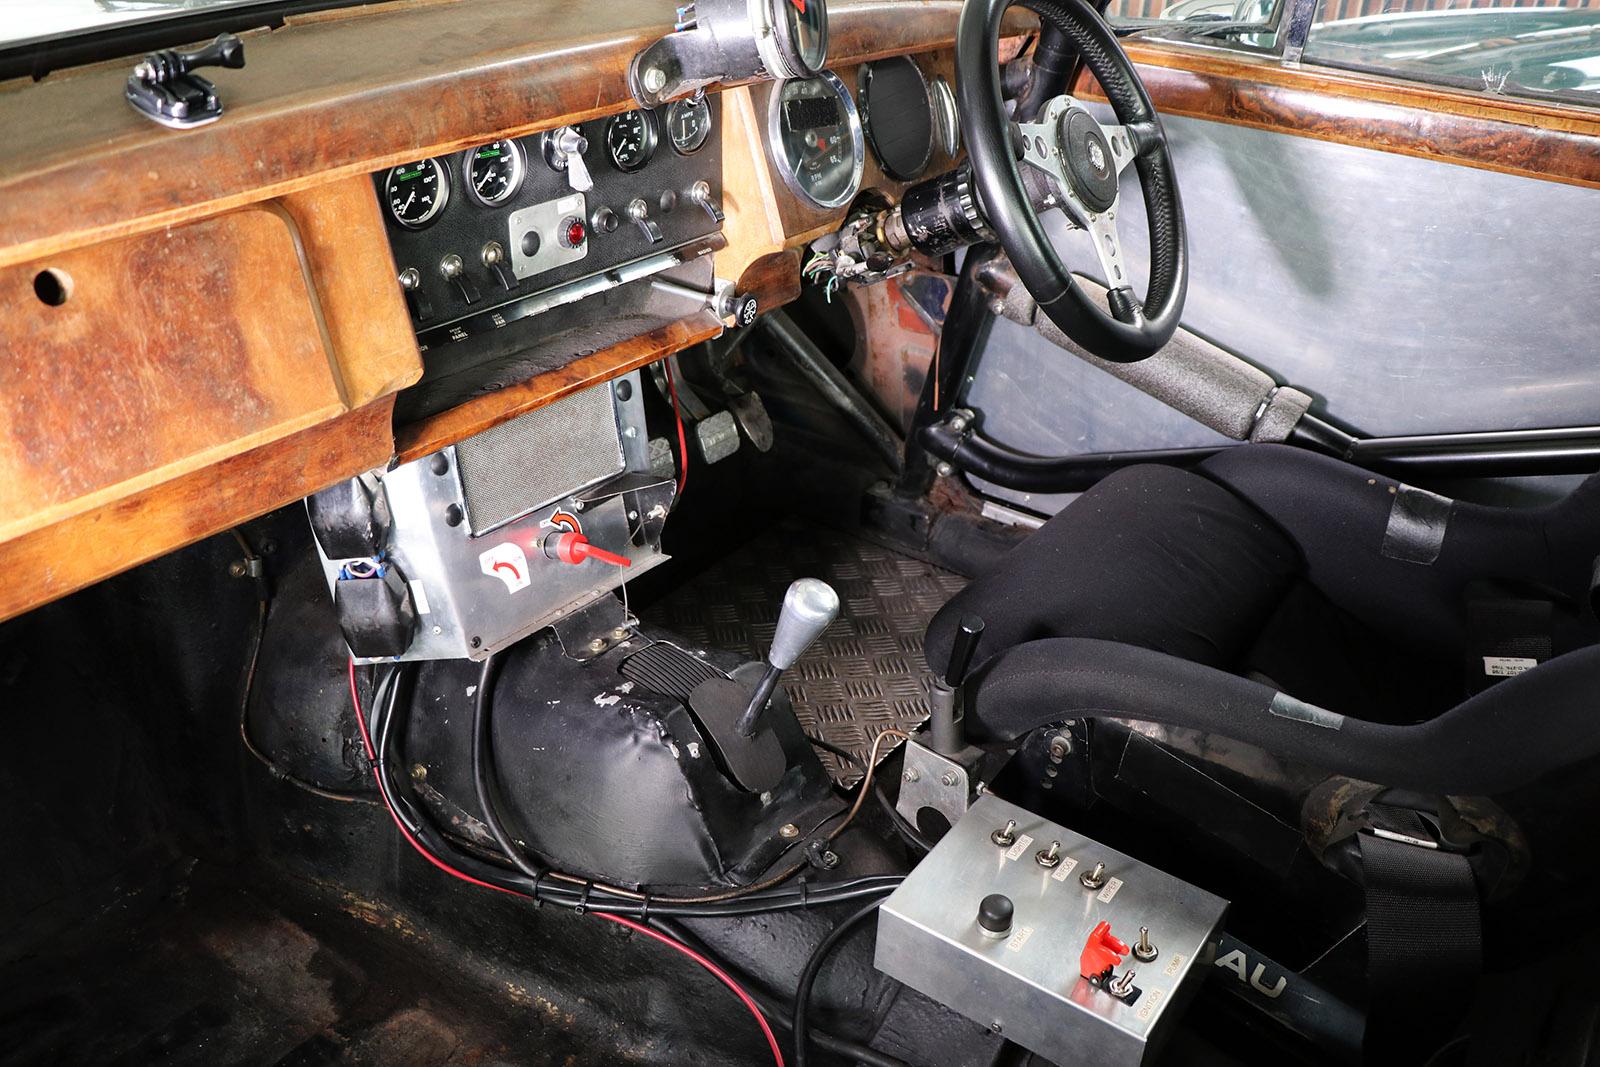 1963_Jaguar_competition_Mark 2_II_Sayer Selection_Wilkinson_ 21_web.jpg